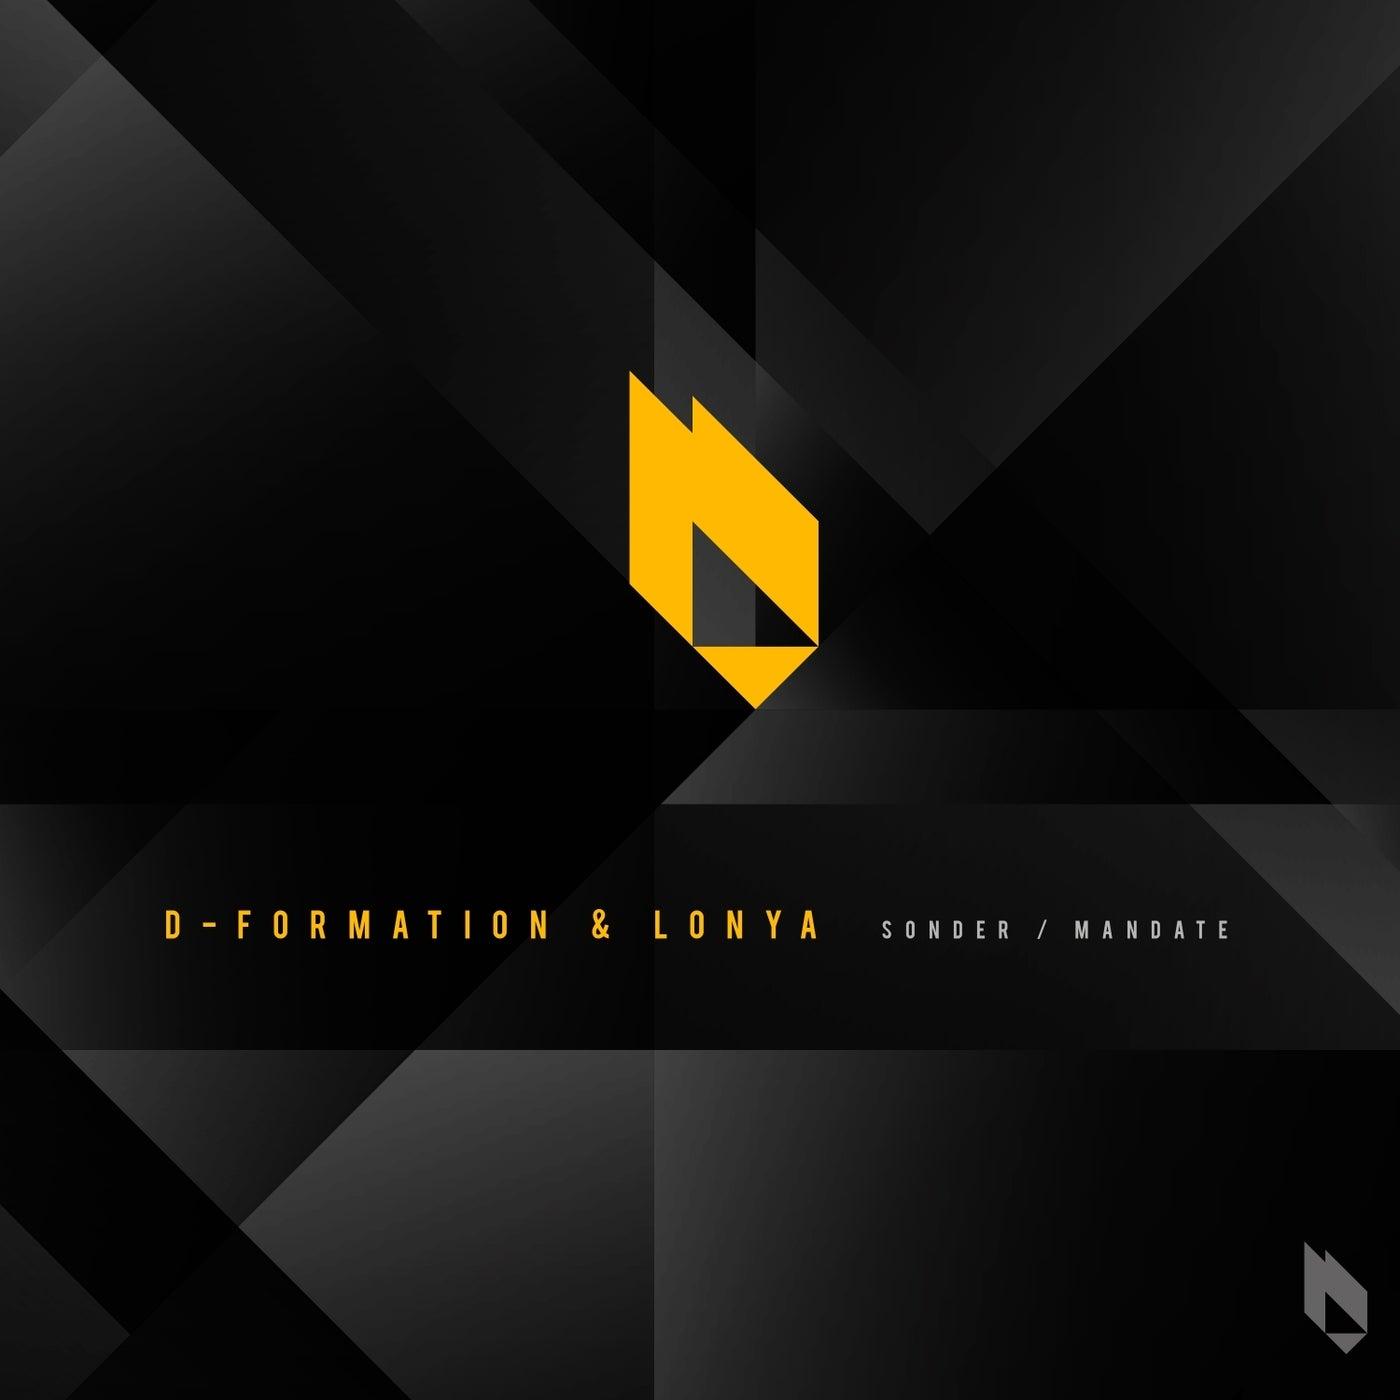 Sonder (Original Mix)